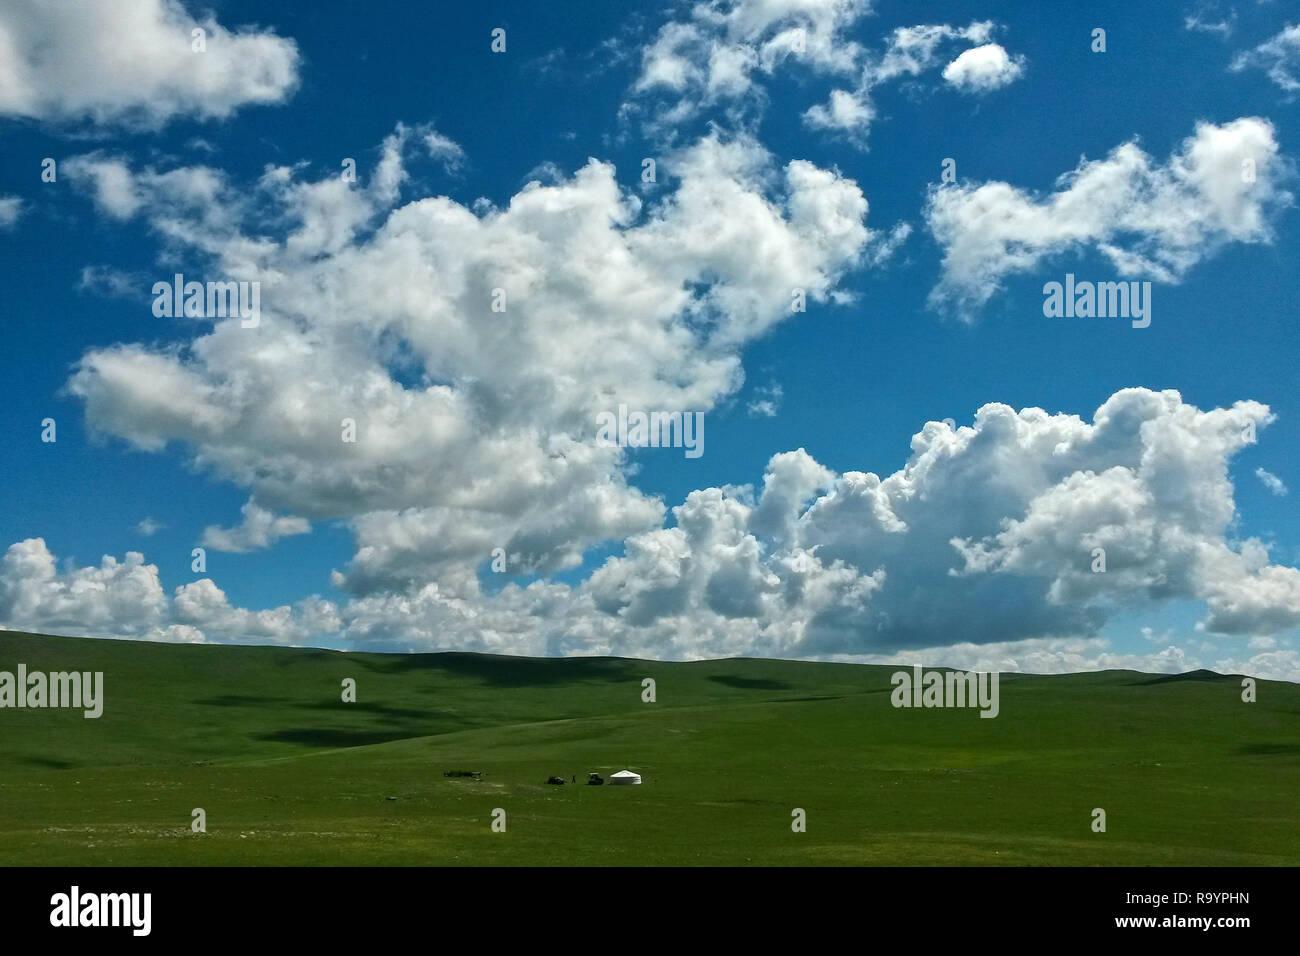 Lonely mongolische Jurte in weiten Steppen Landschaft unter herrlichen blauen Himmel, Bulgan, Mongolei Stockbild